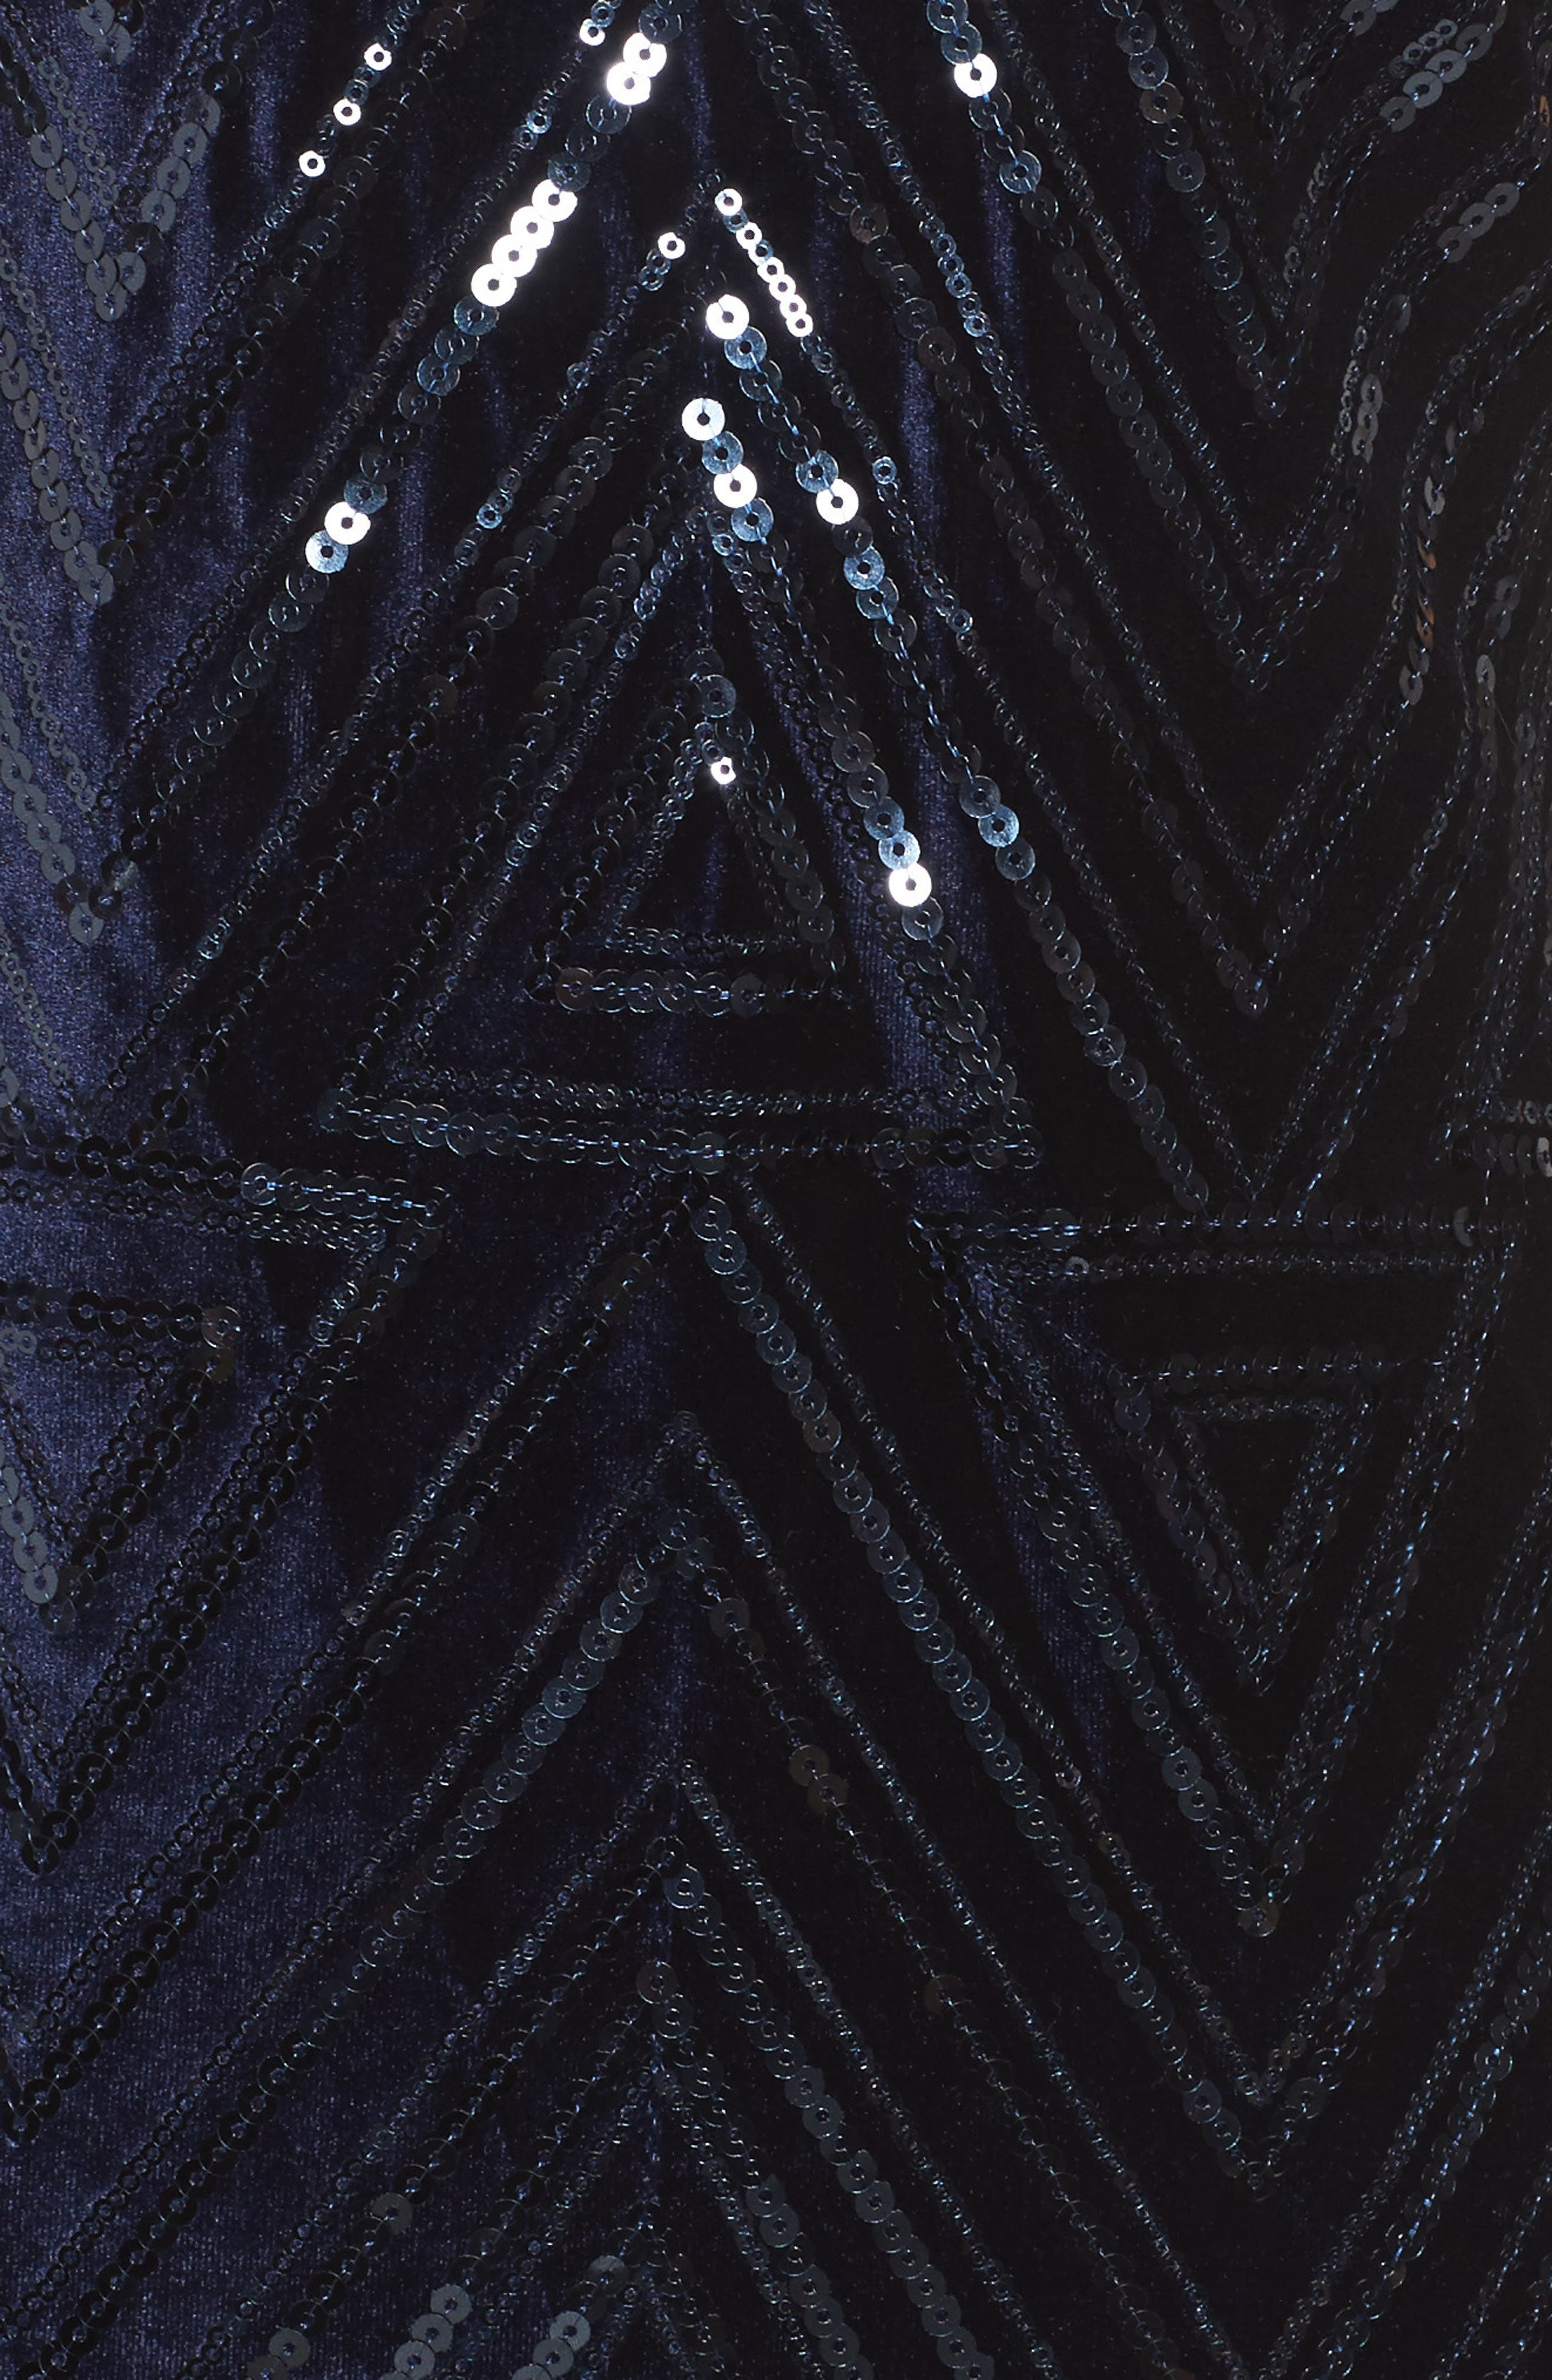 Sequin Sheath Dress,                             Alternate thumbnail 5, color,                             Navy